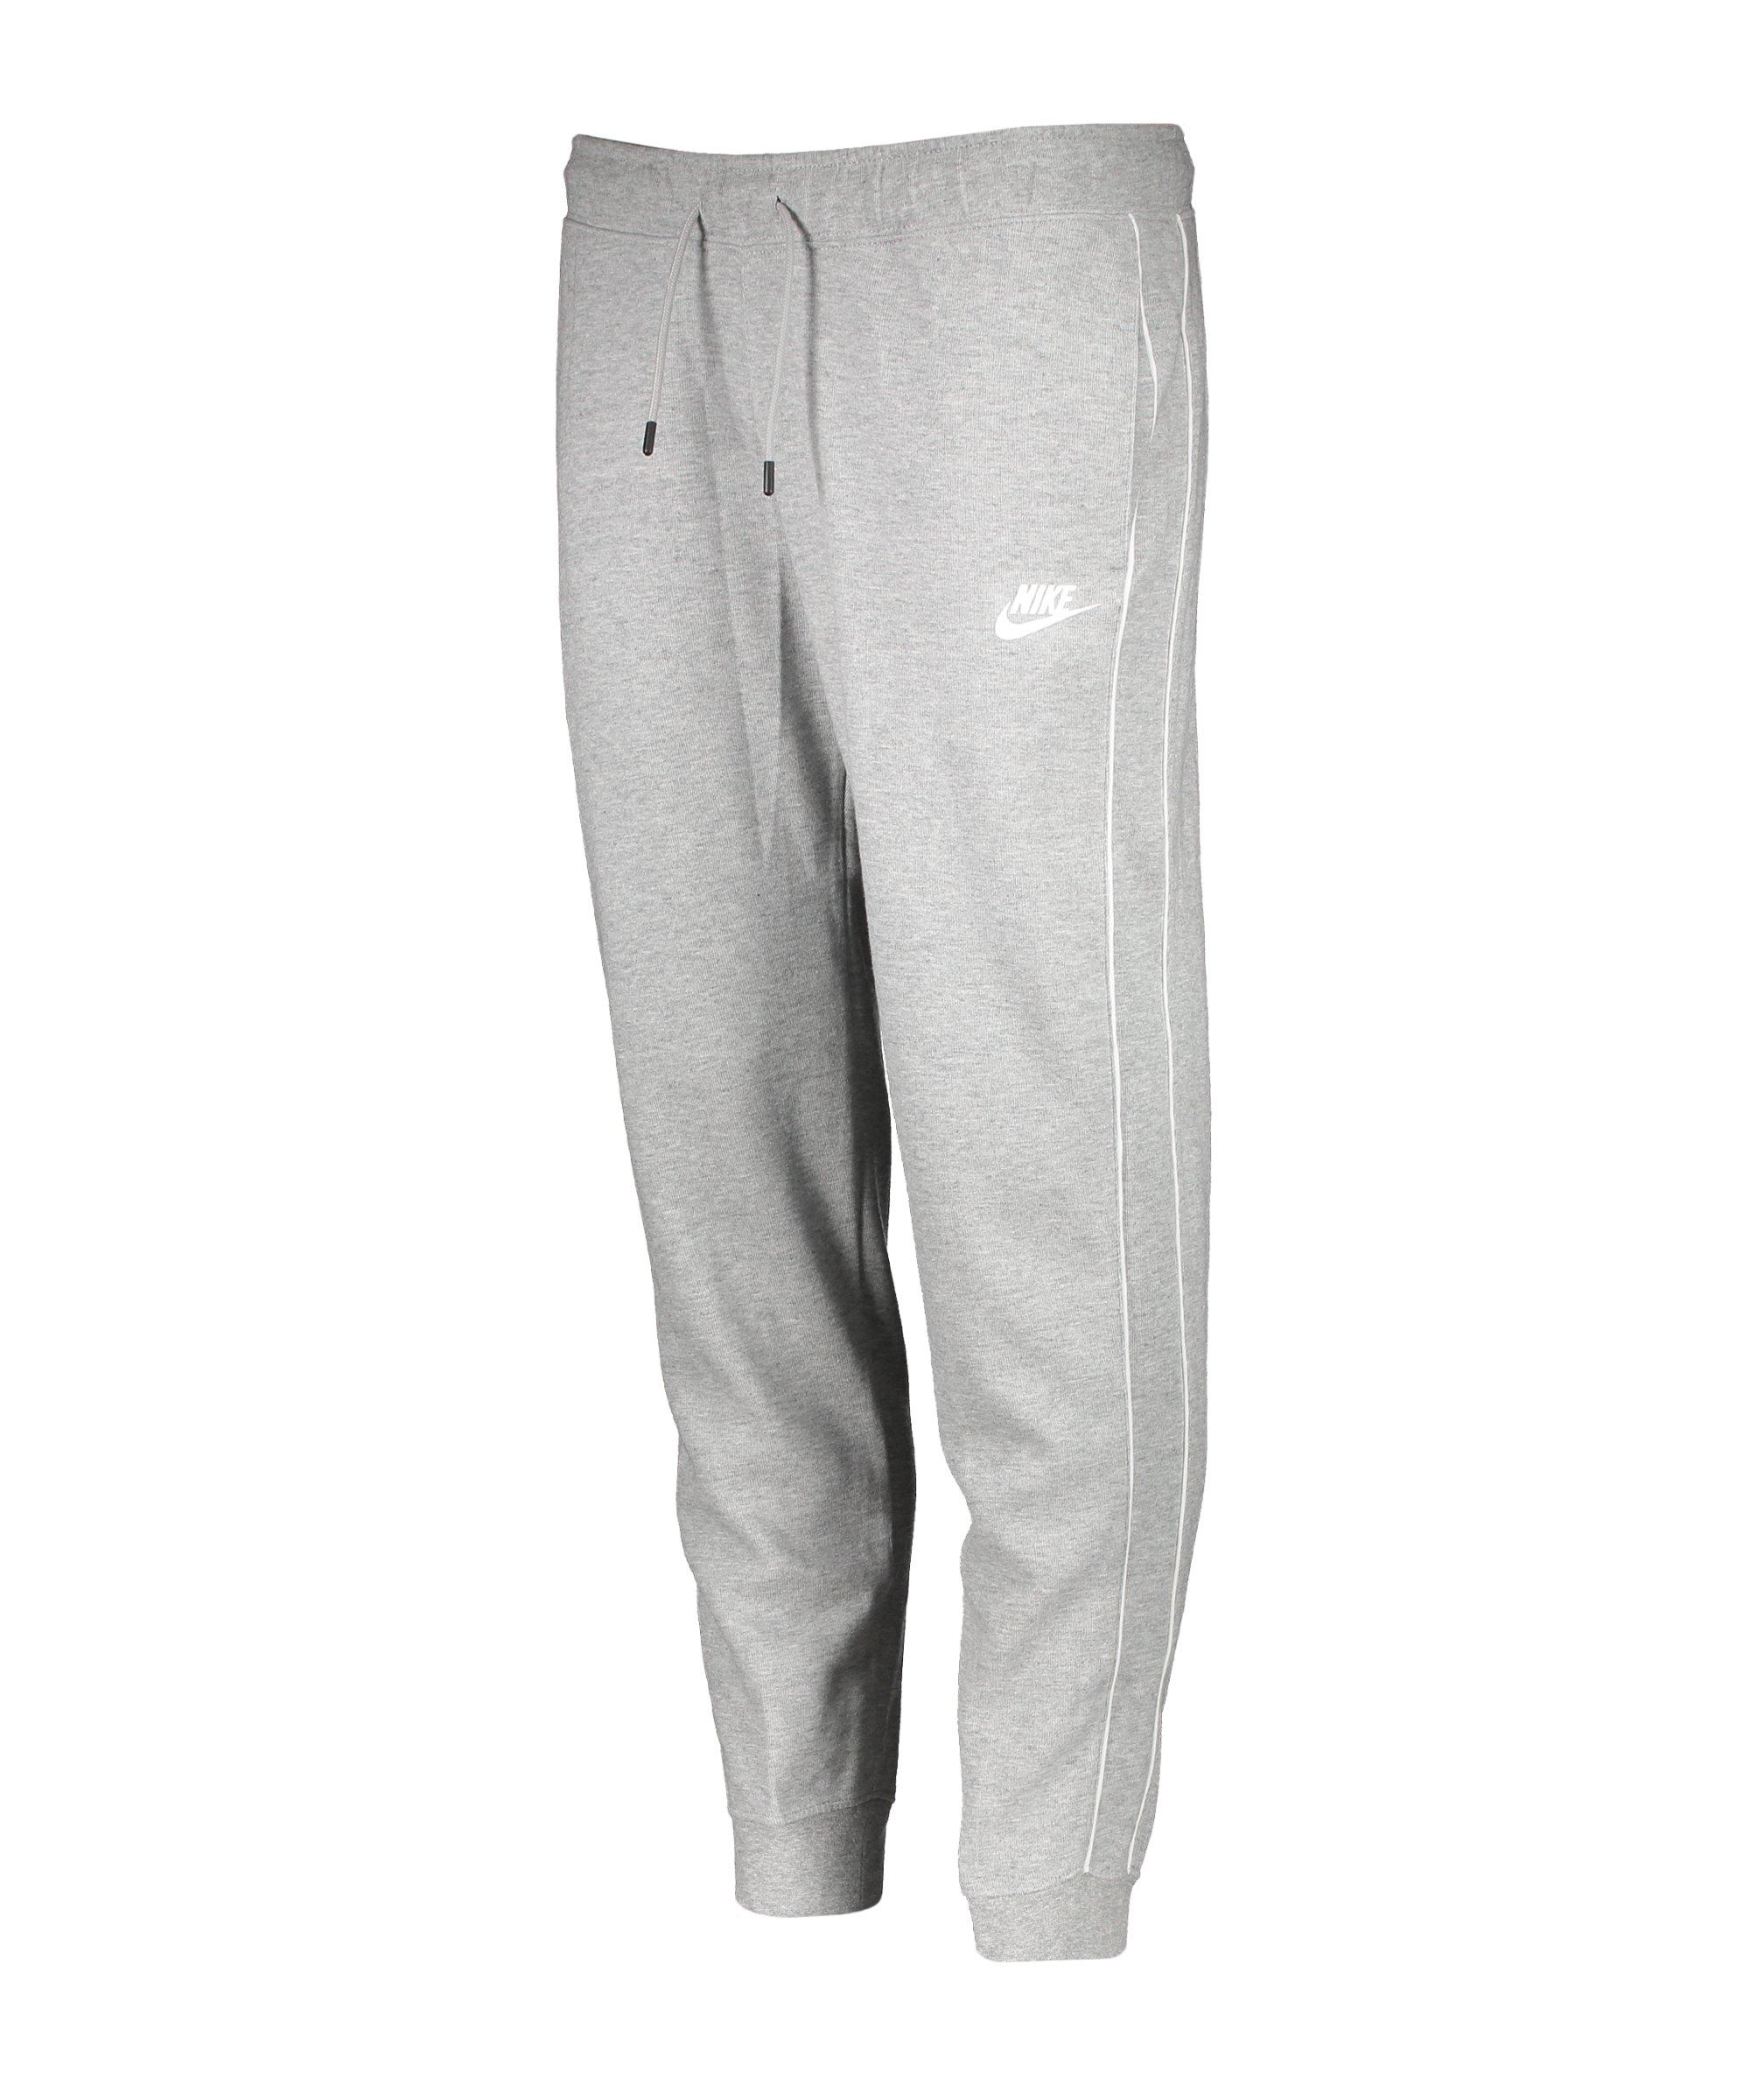 Nike Essentials Joggingshose Damen Grau Weiss F063 - grau